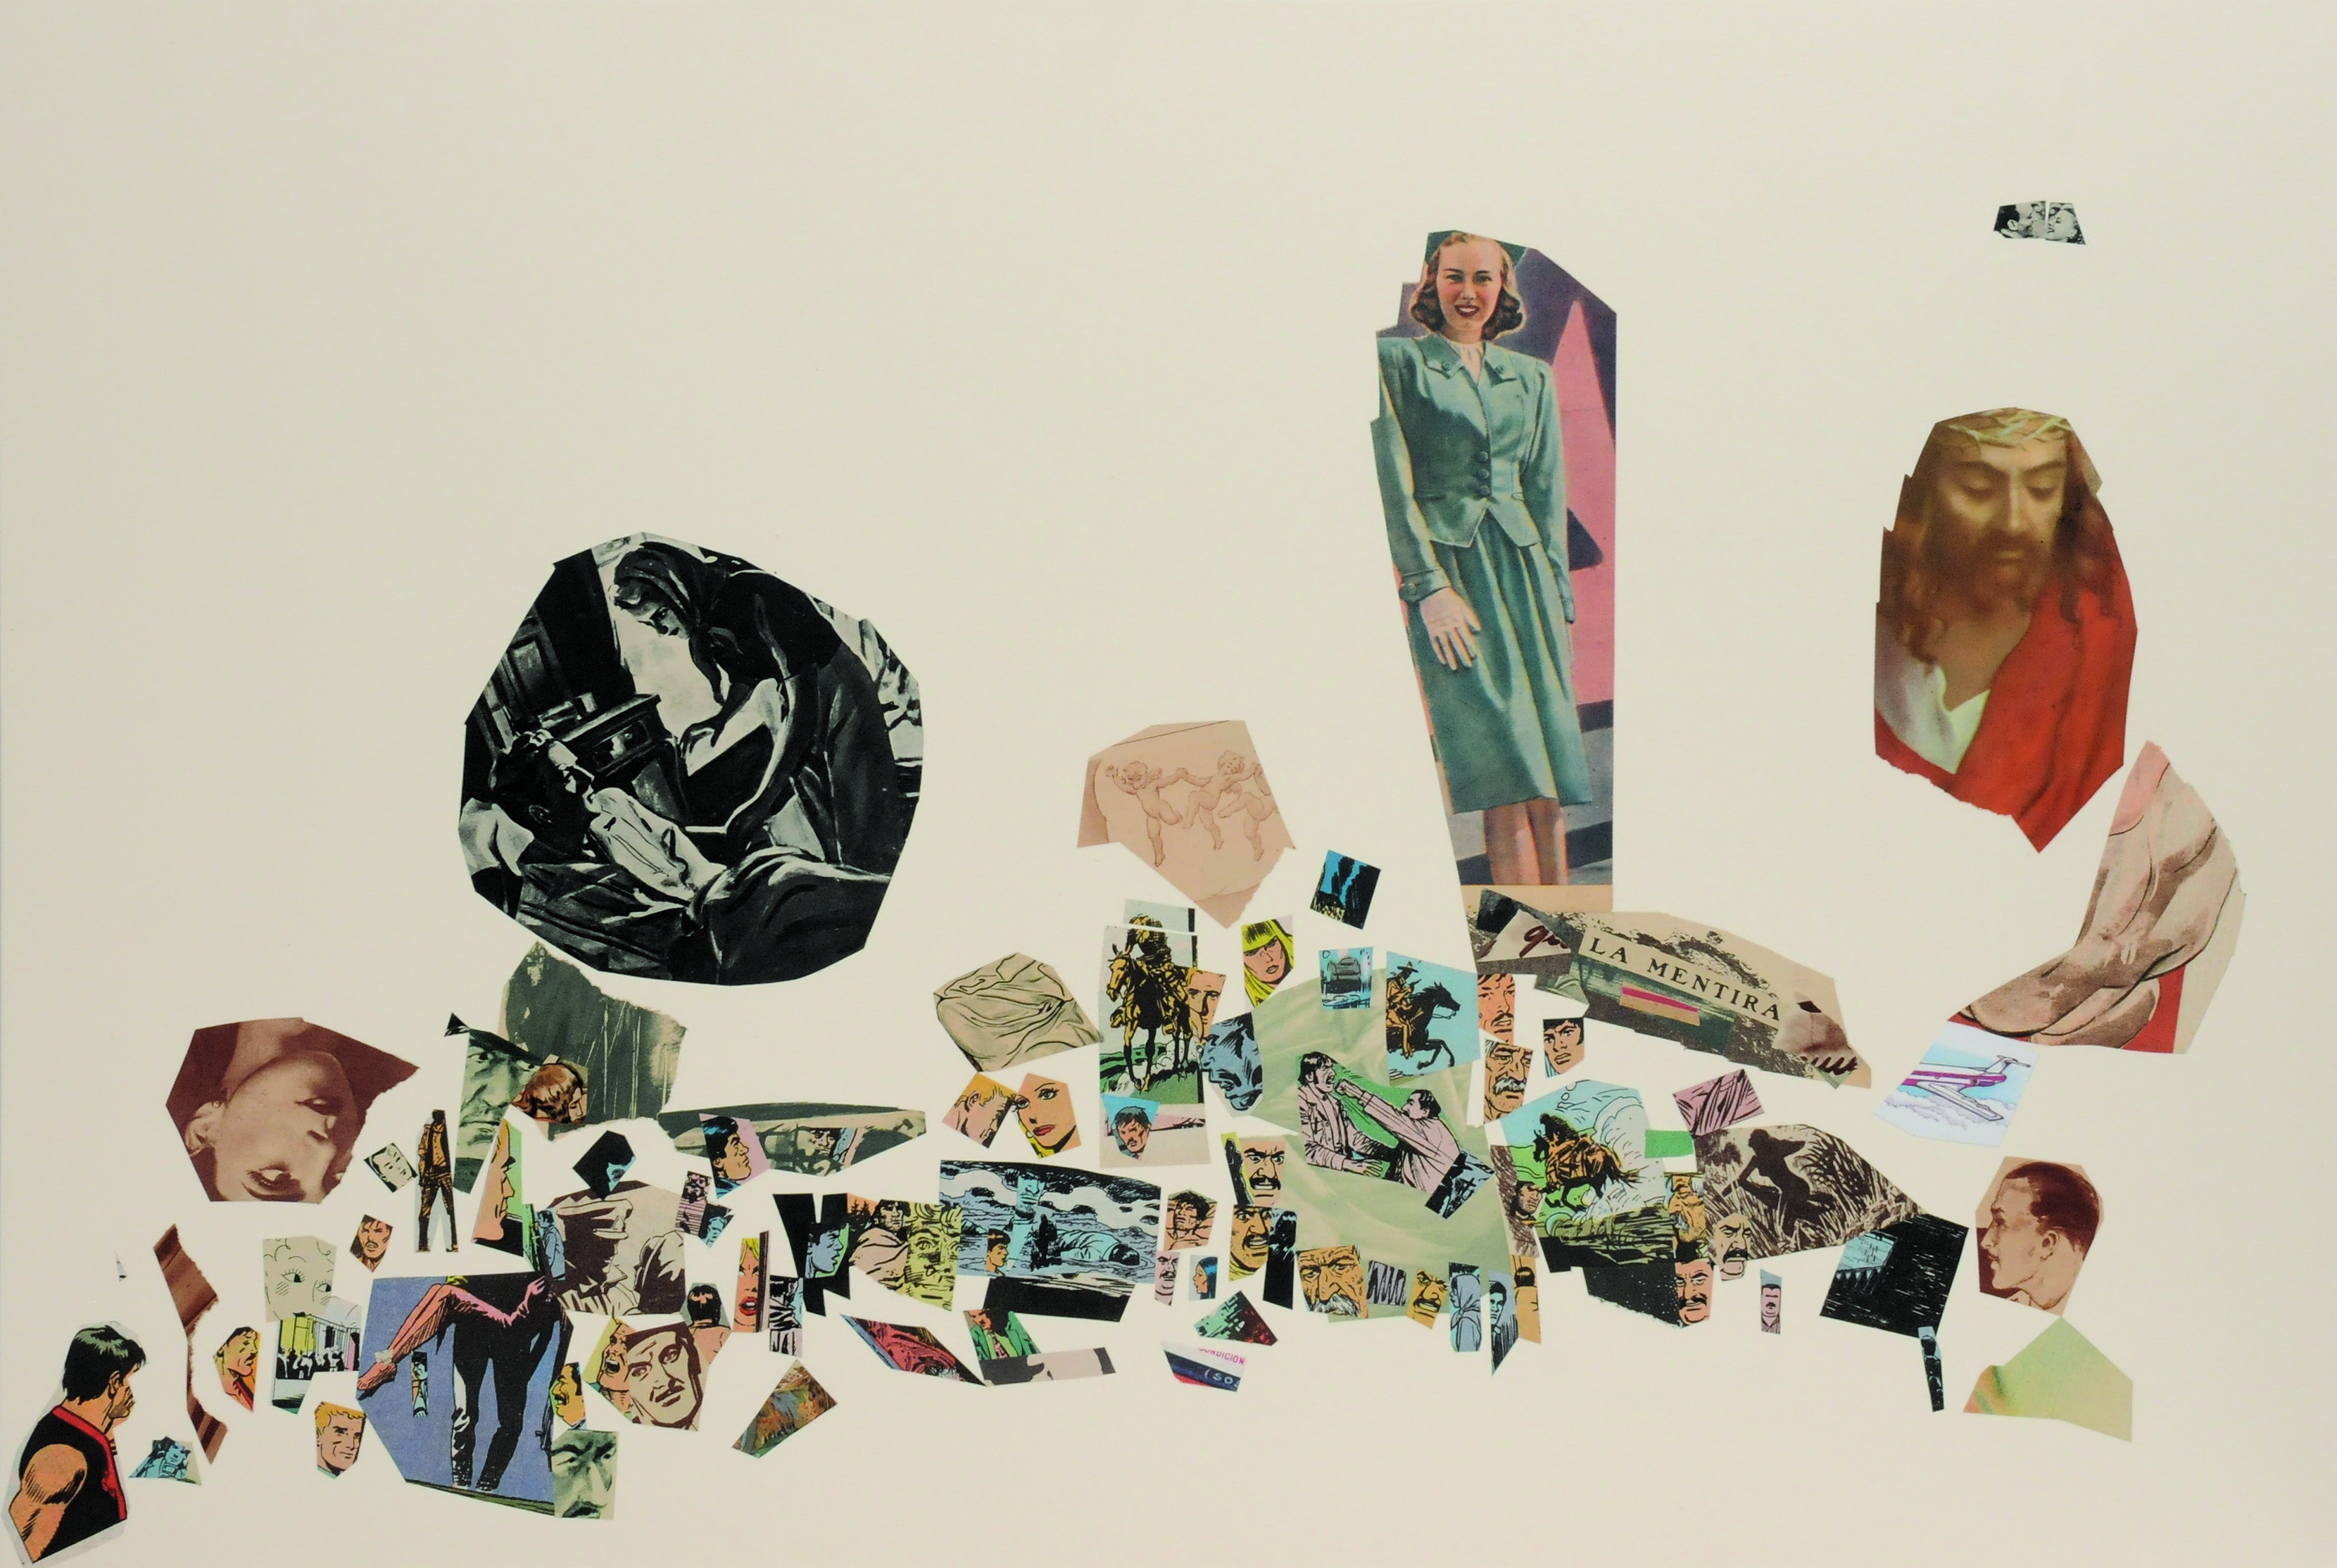 La mentira, papel collage, 51 cm x 76 cm. 2008